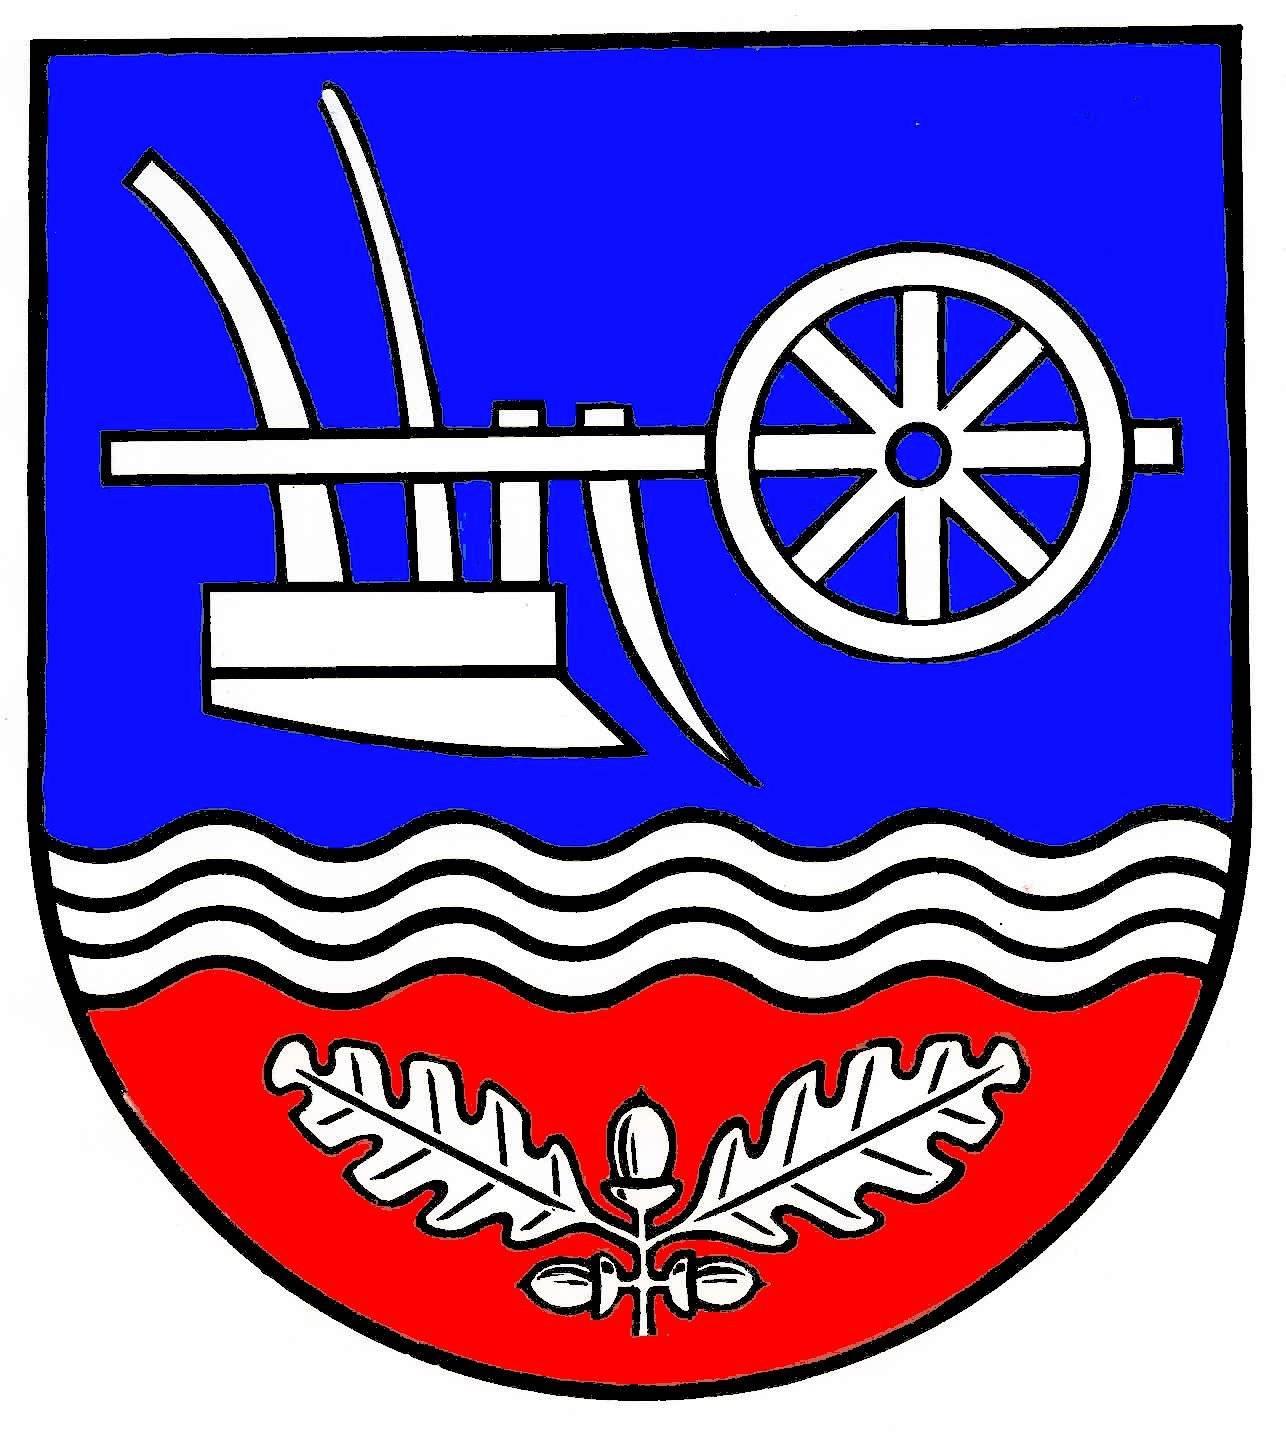 Wappen GemeindeBösdorf, Kreis Plön